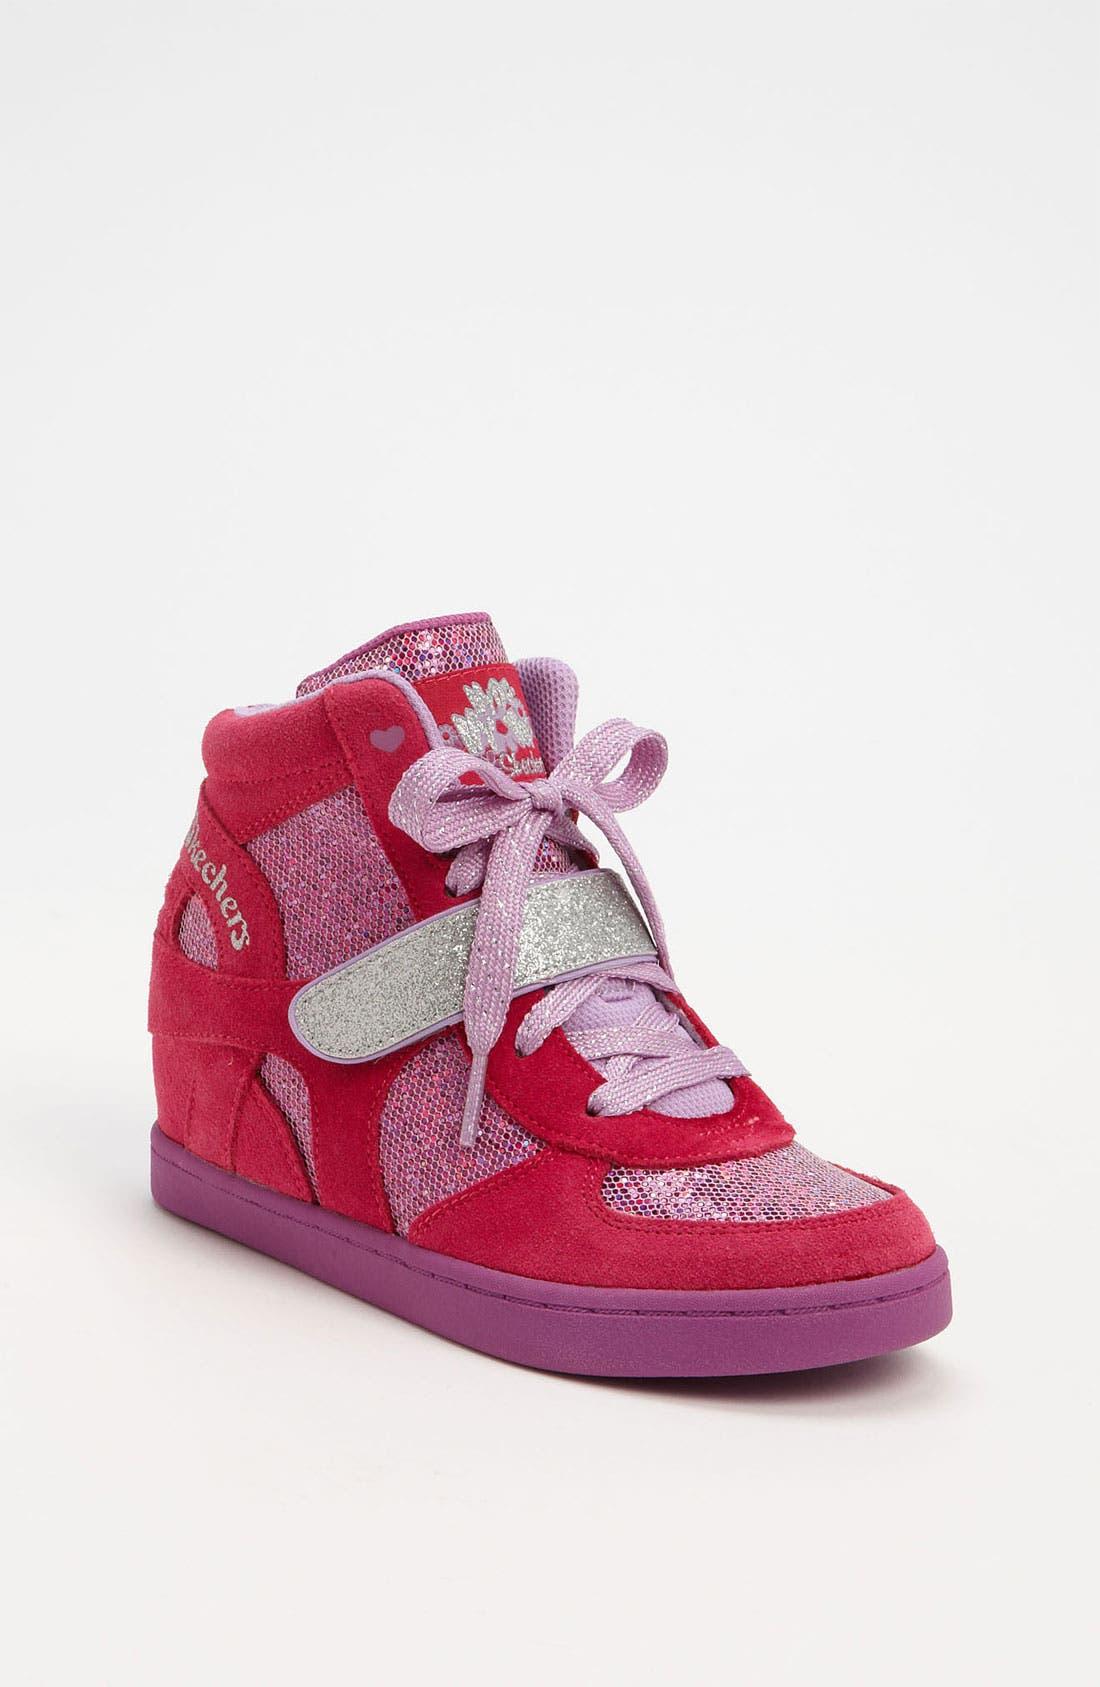 Main Image - SKECHERS 'Plus 2' Wedge Sneaker (Little Kid)